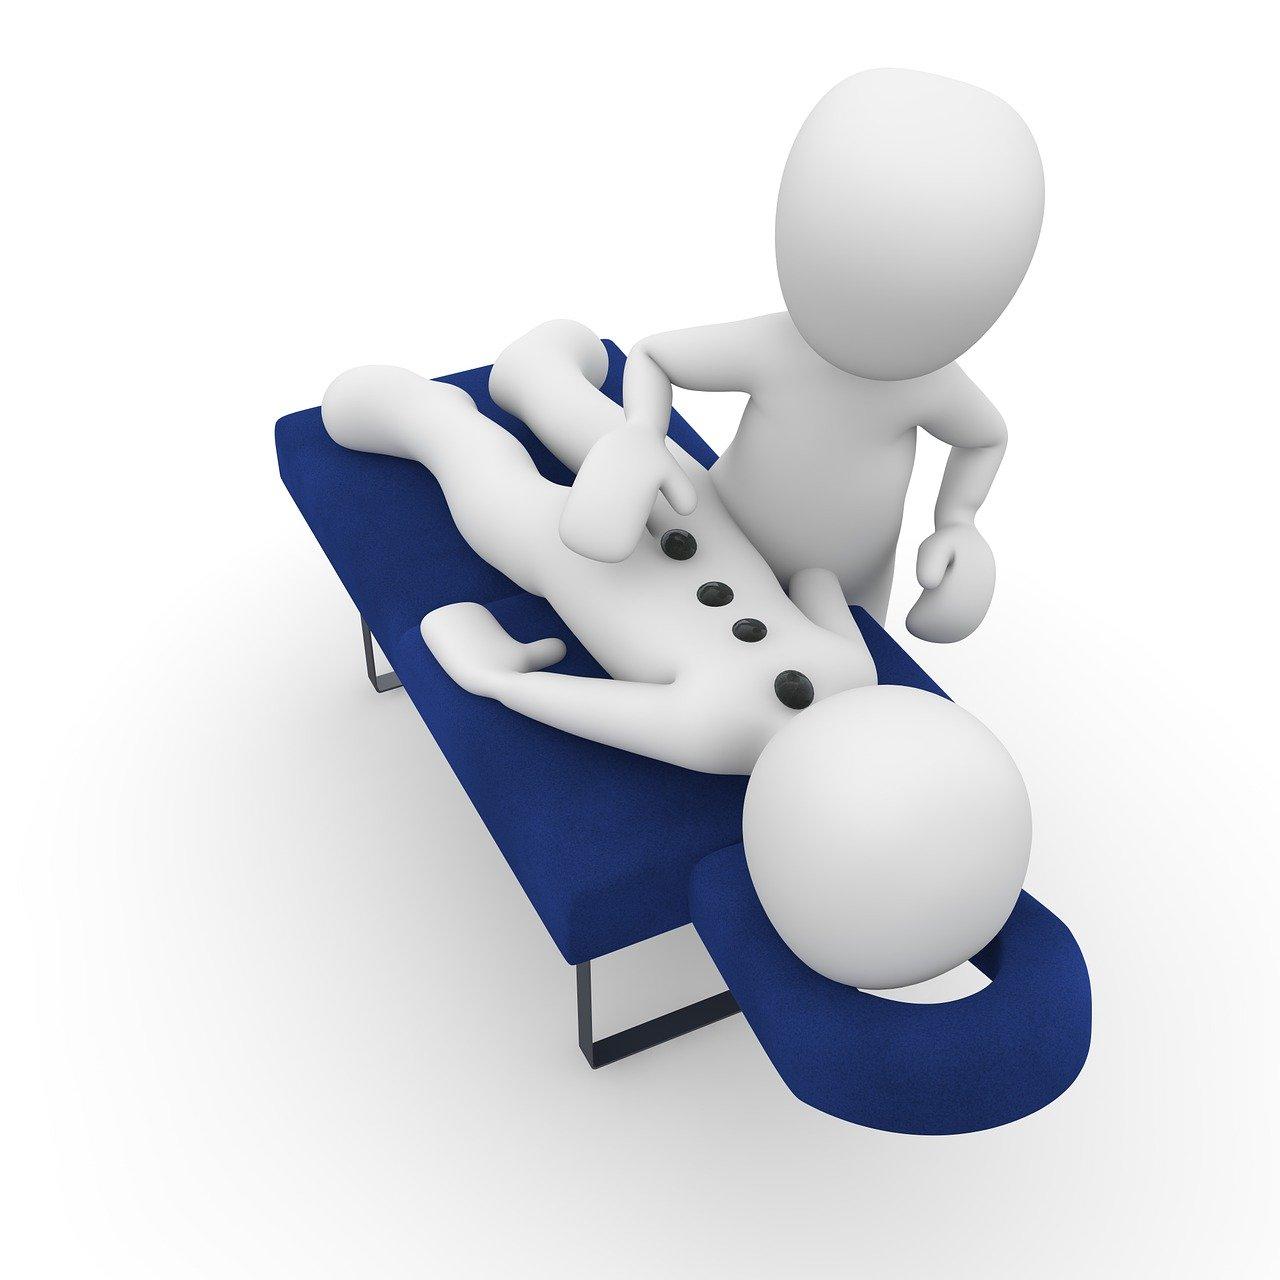 Kinderfysiotherapie Sint-Oedenrode manueel therapeut